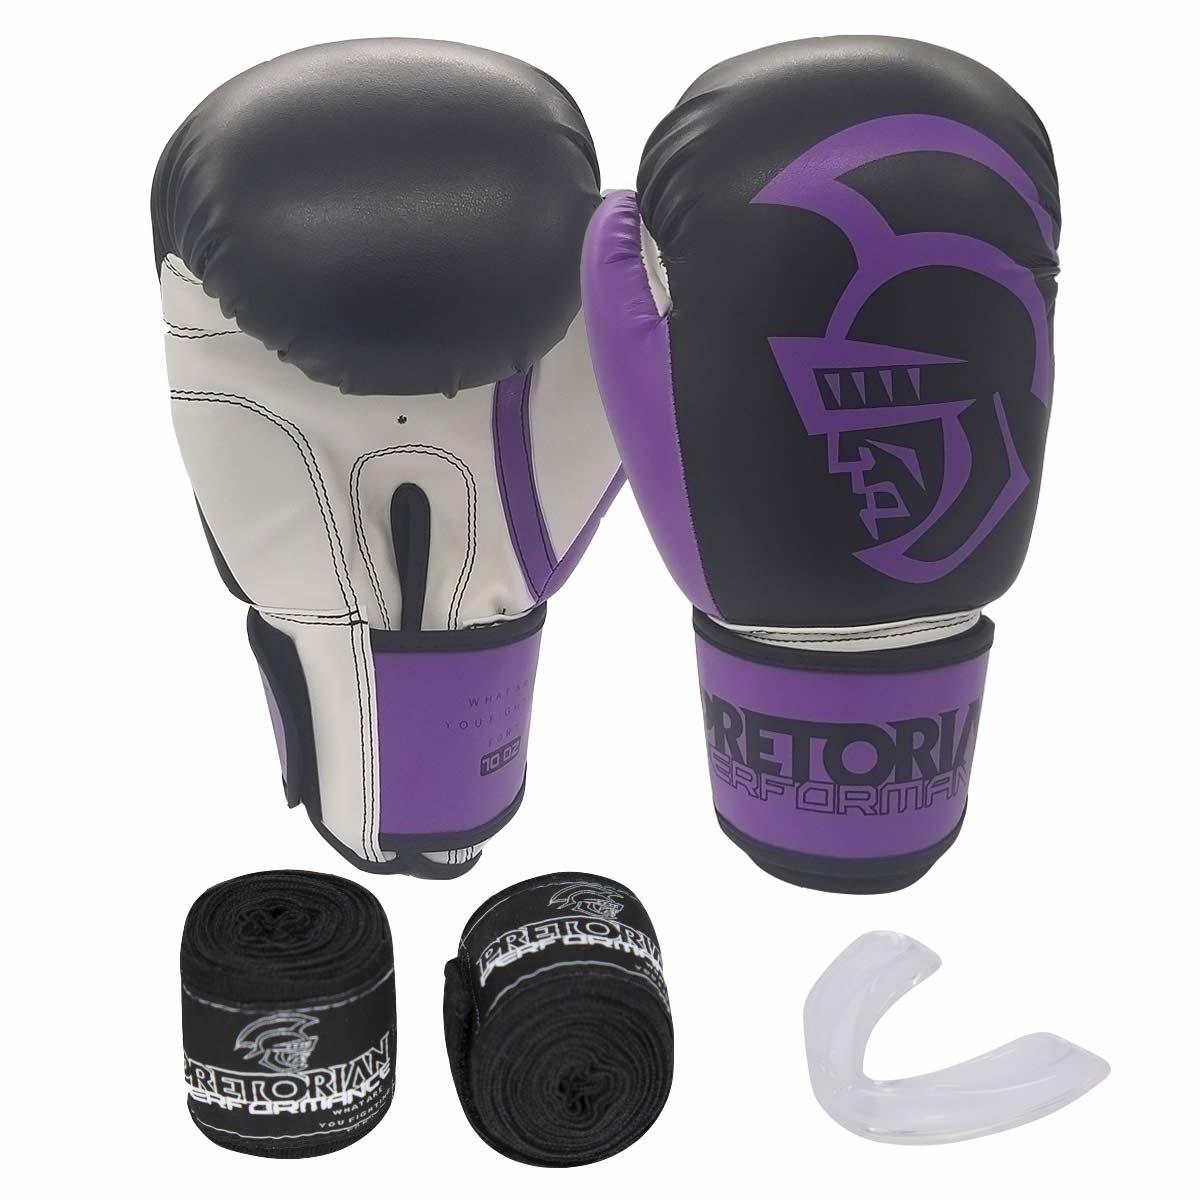 Kit de Boxe Thai Pretorian: Bandagem + Protetor Bucal + Luvas de Boxe Performance - Roxa - 12 / 14 OZ